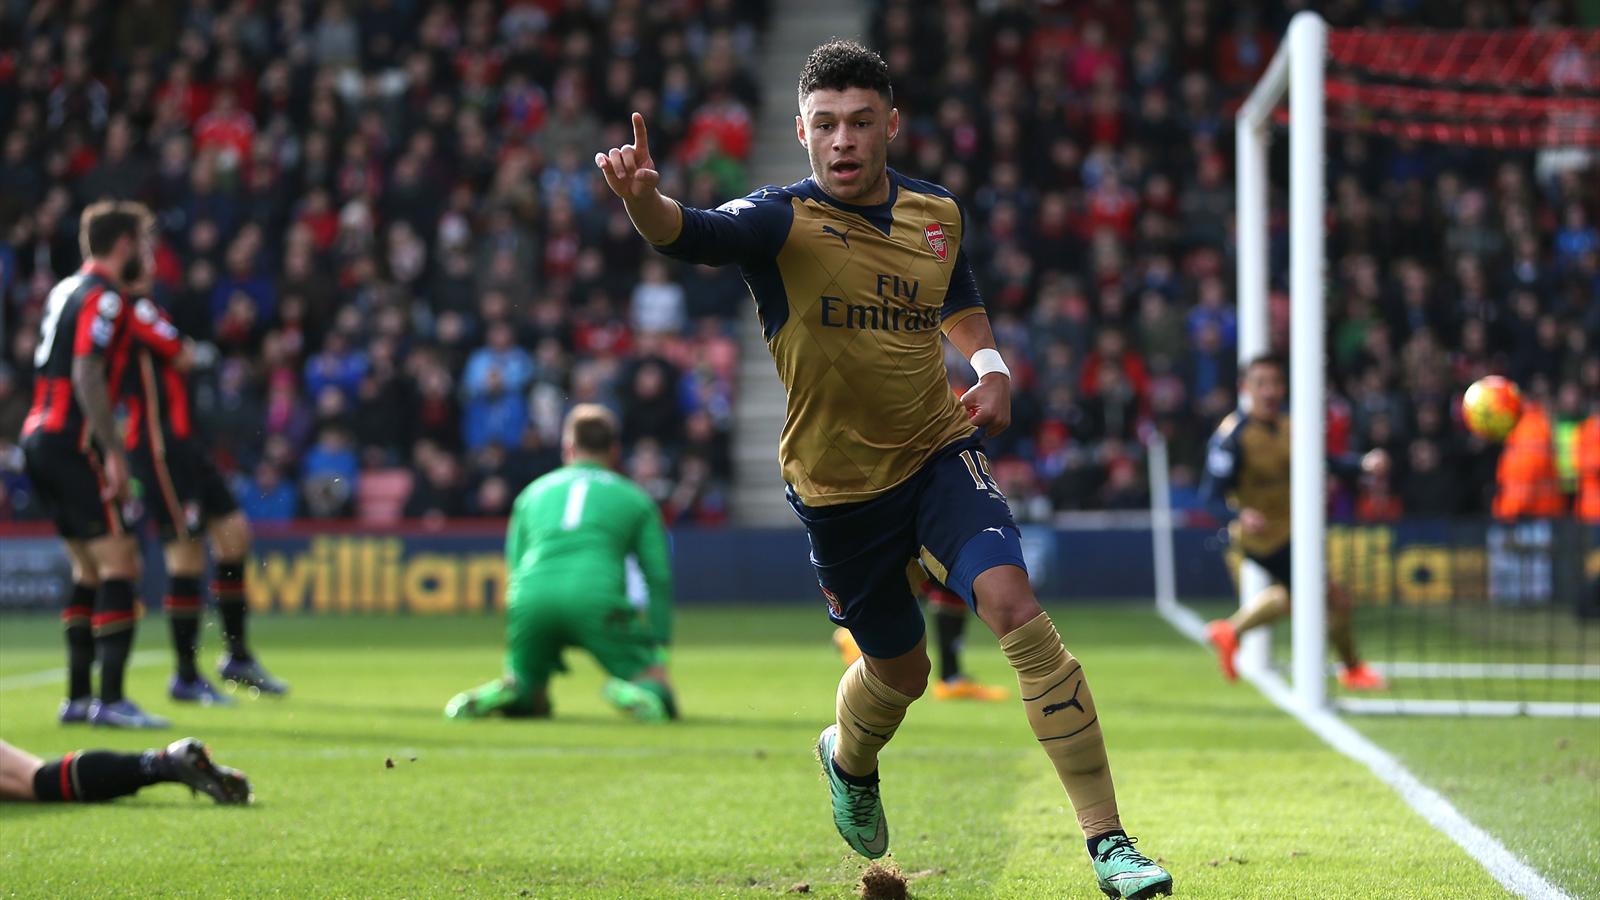 Alex Oxlade-Chamberlain celebrates scoring for Arsenal against Bournemouth